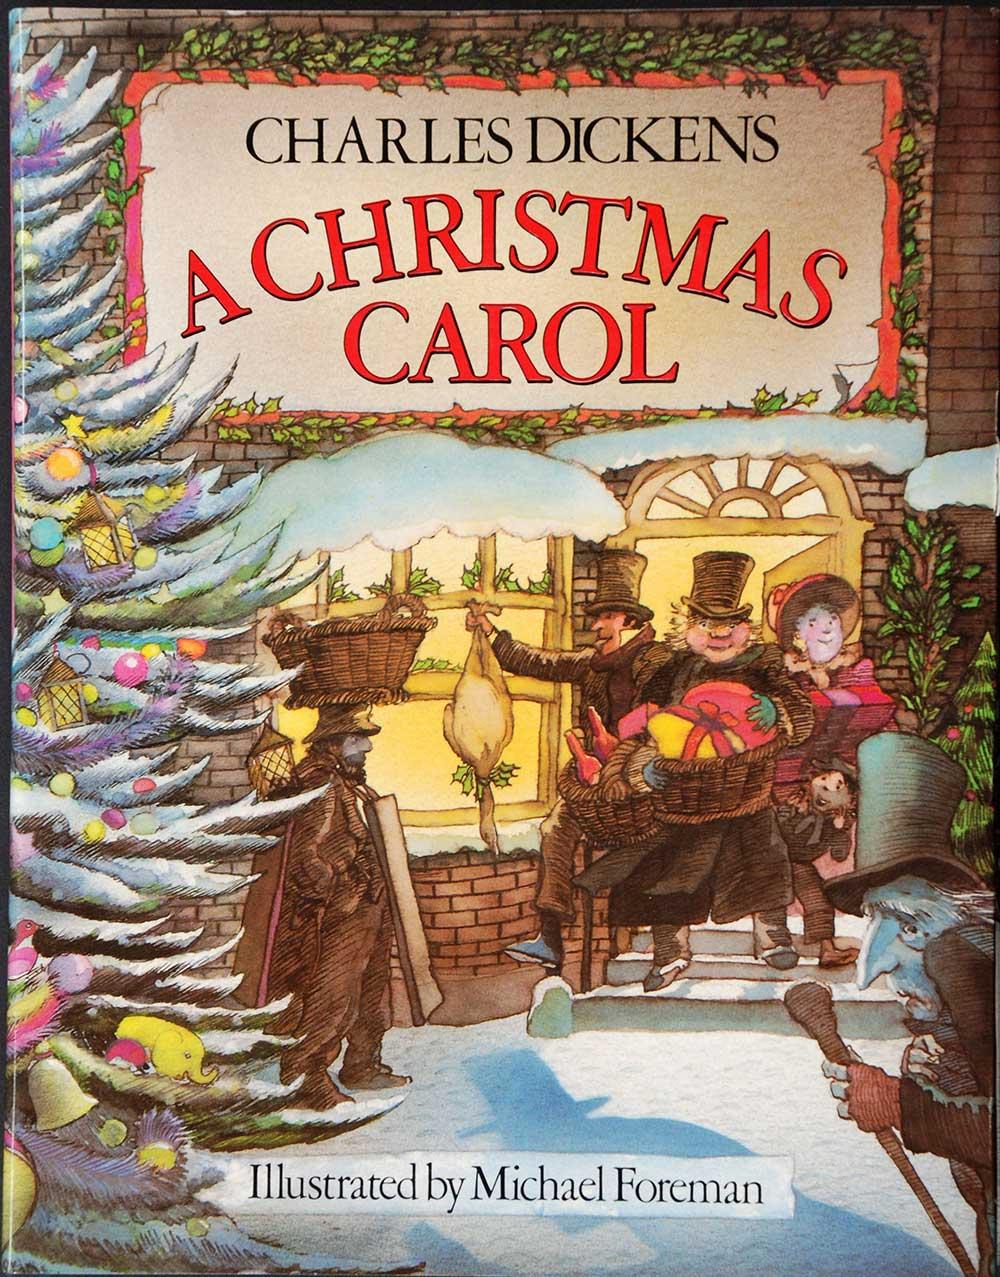 Charles Dickens. <em>A Christmas carol.</em> Illustrated by Michael Foreman. London: Victor Gollancz, 1983.